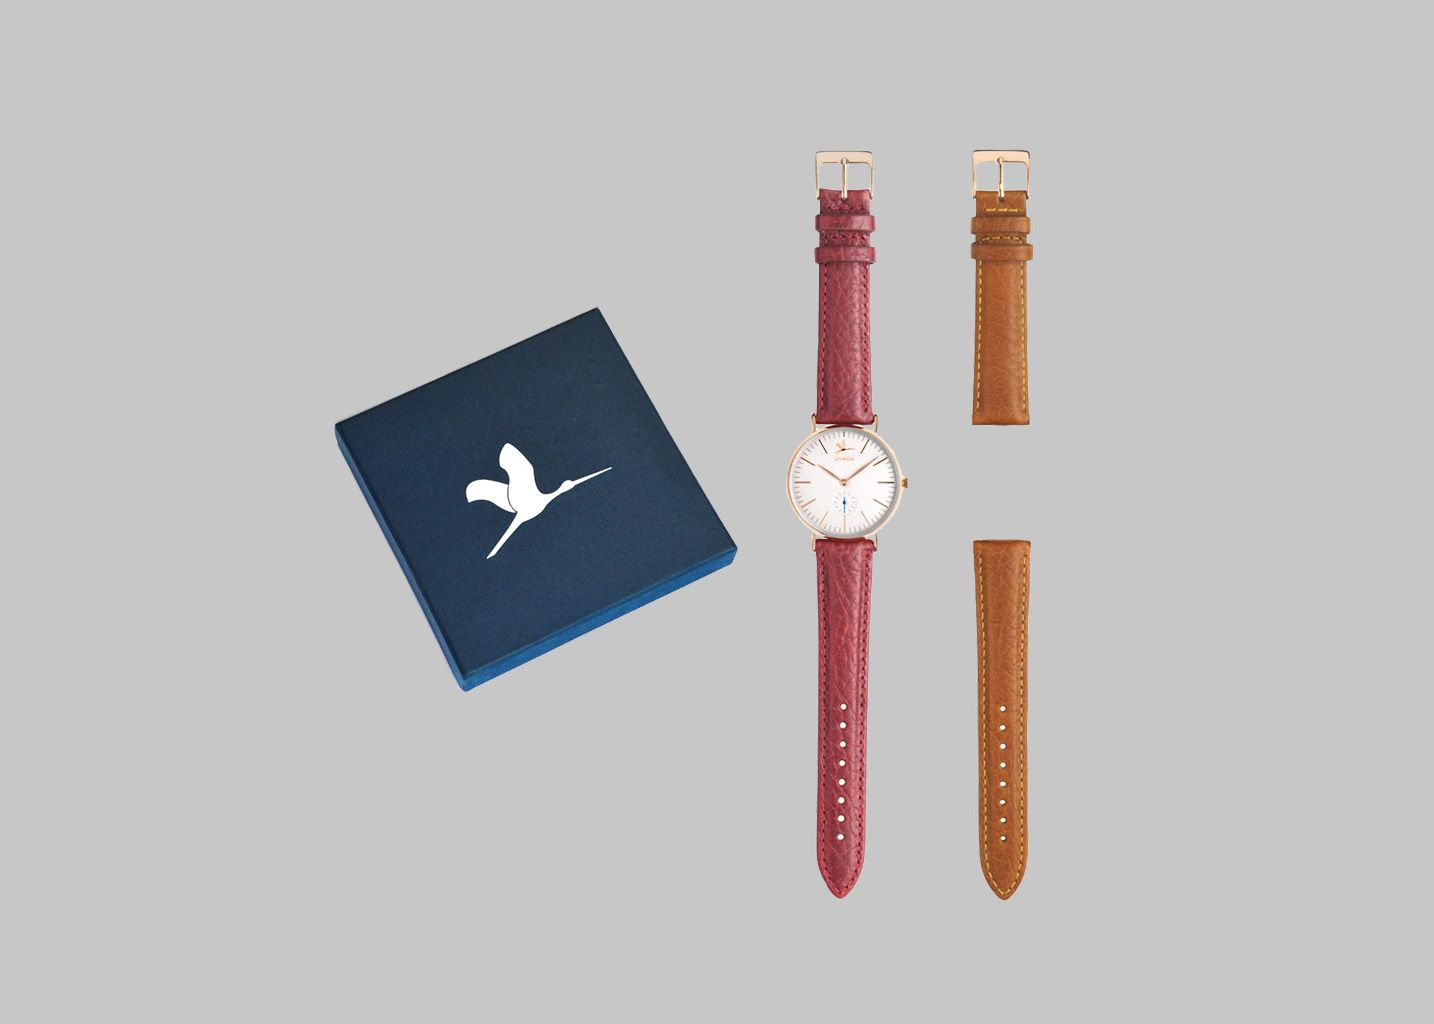 Coffret La Monet - Charlie Watch